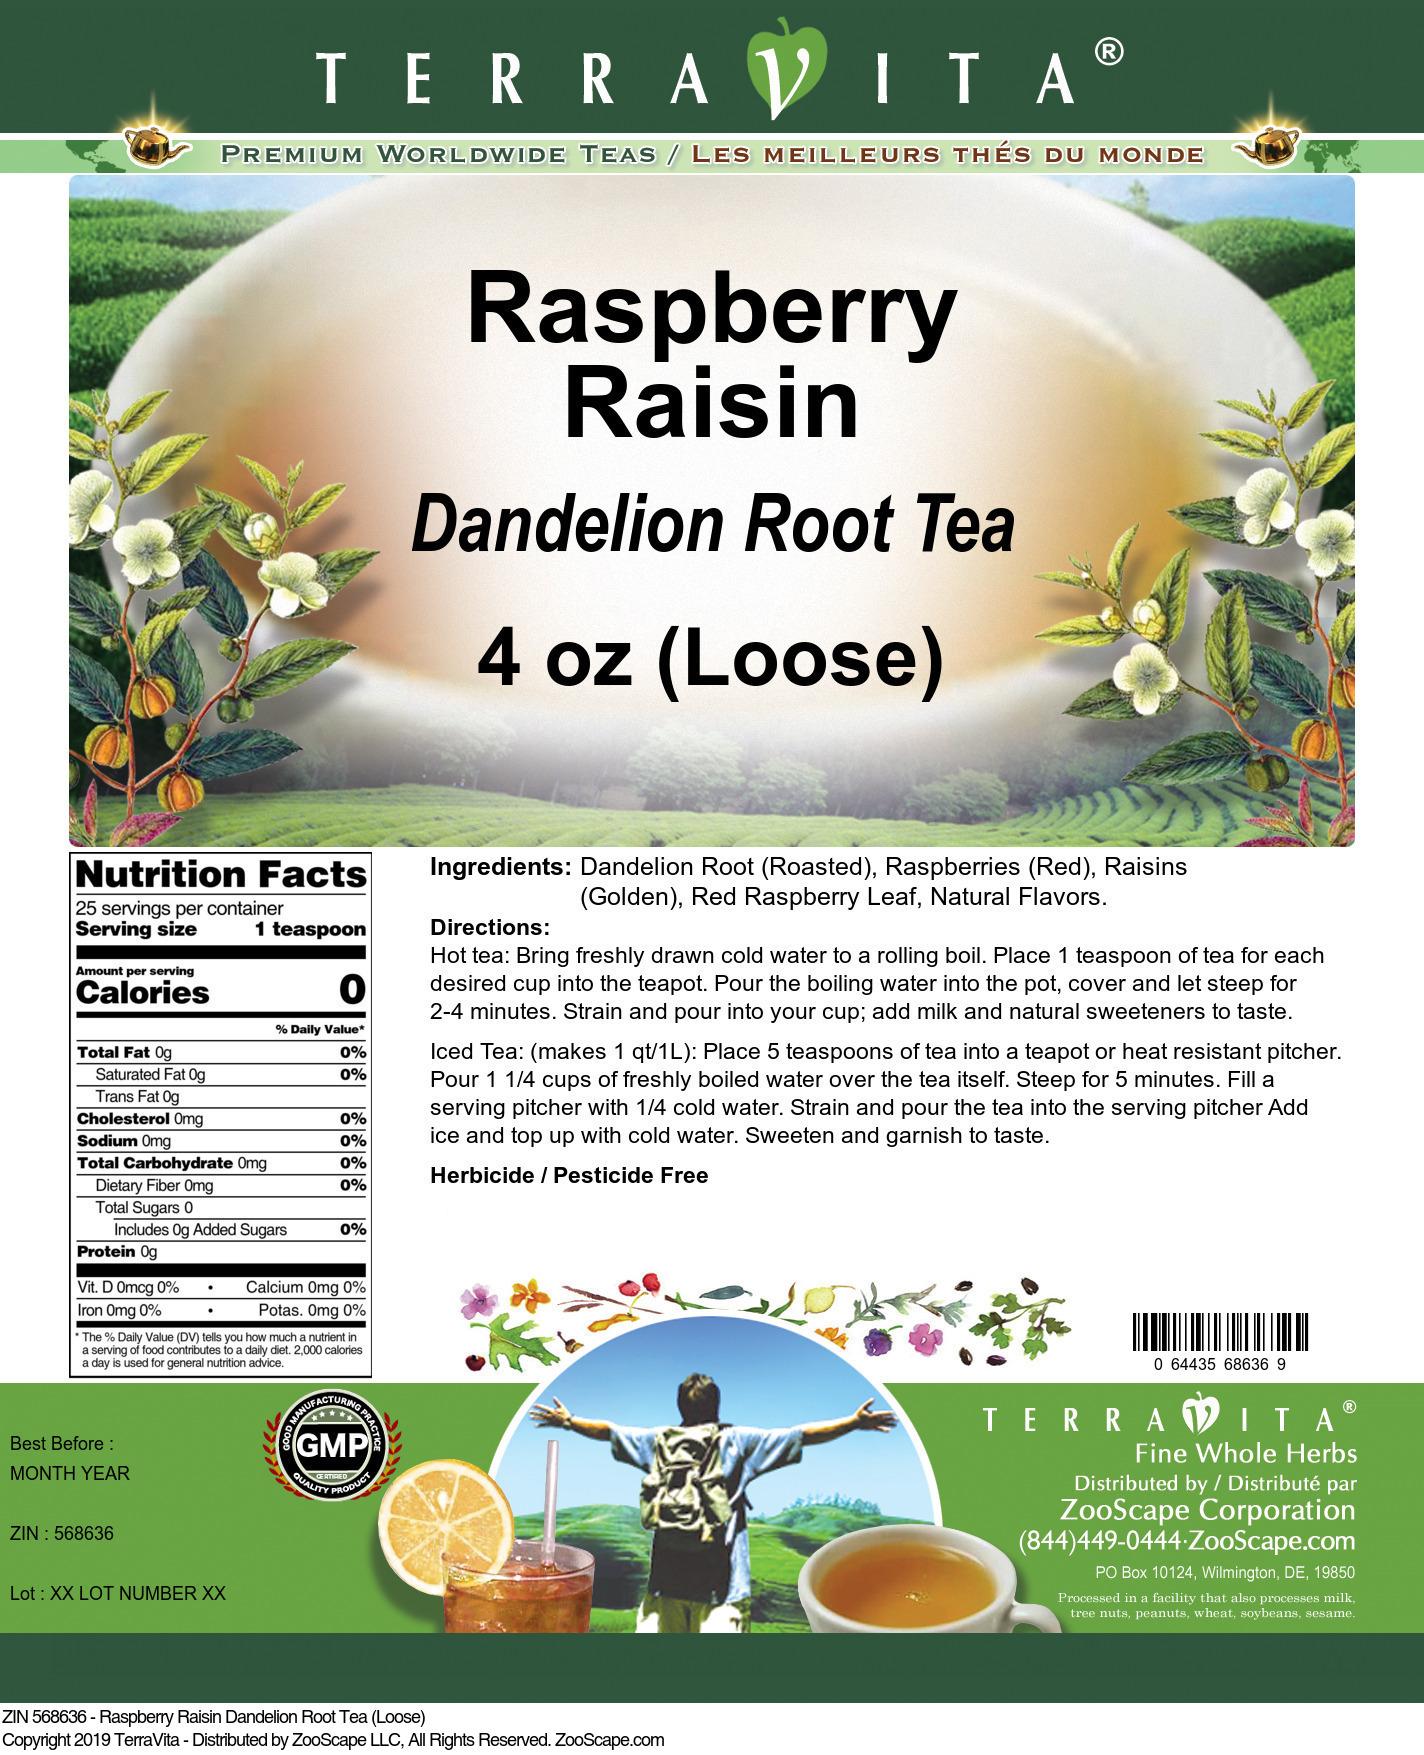 Raspberry Raisin Dandelion Root Tea (Loose)